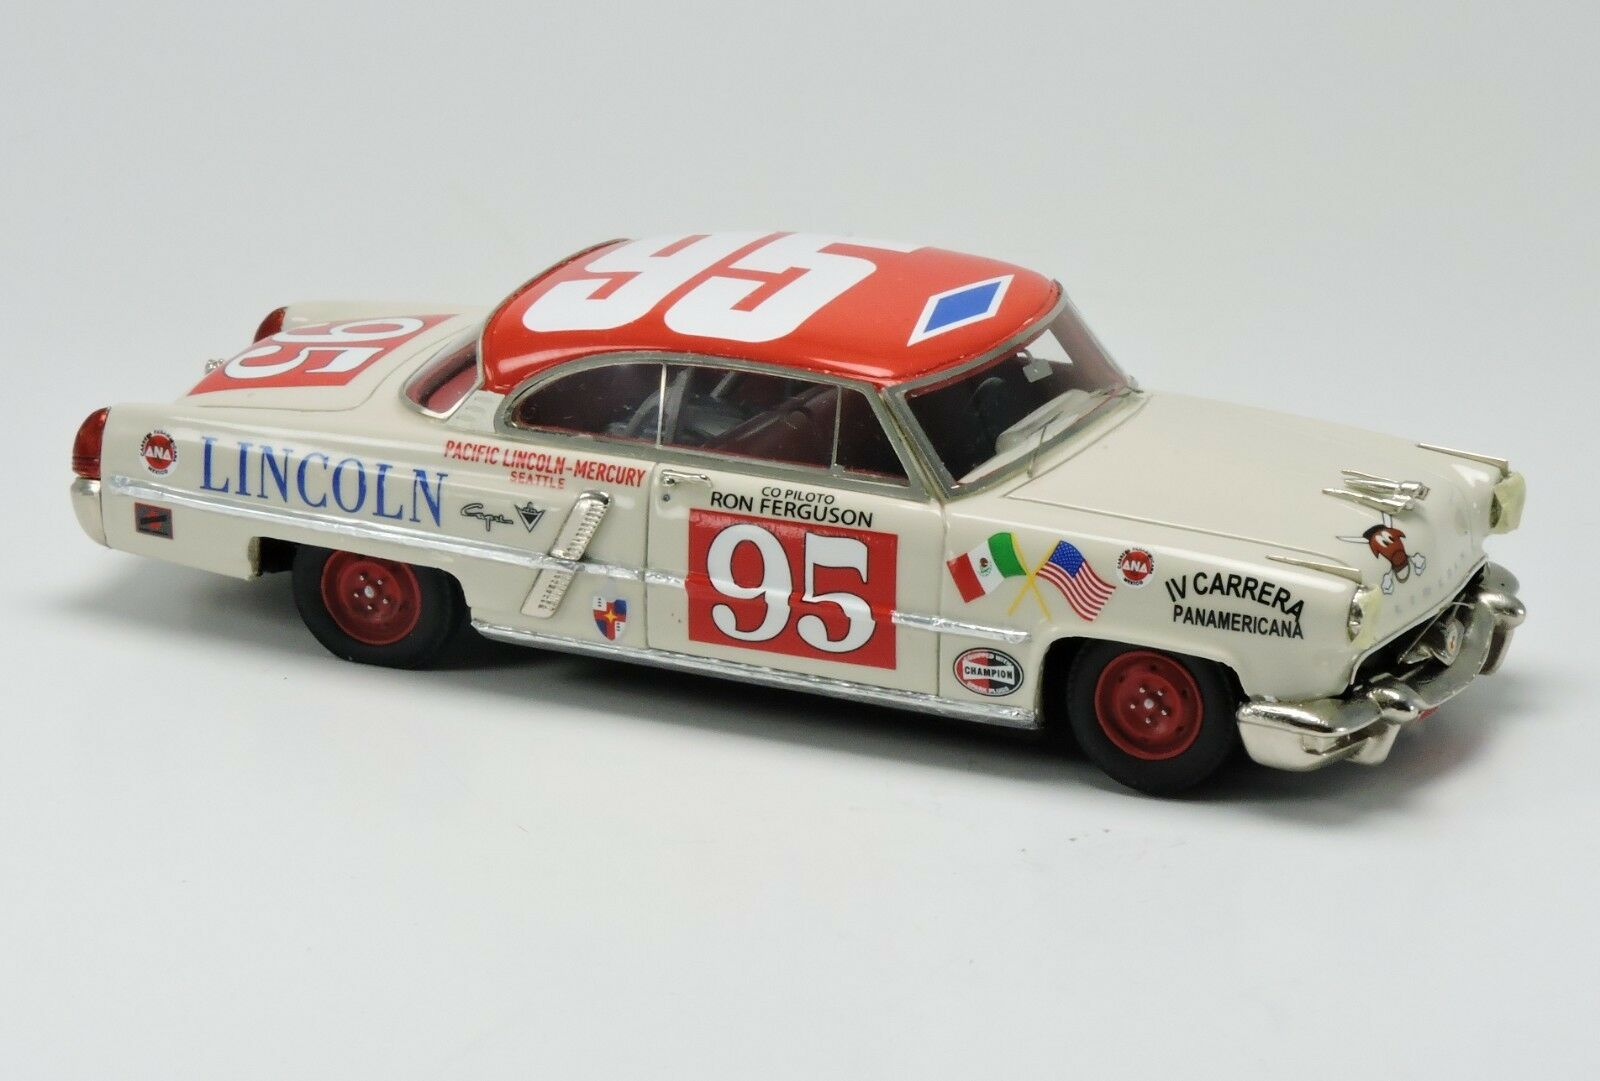 Kit Lincoln Capri IV Carrera Panamericana 1953 Arena Models kit 1 43